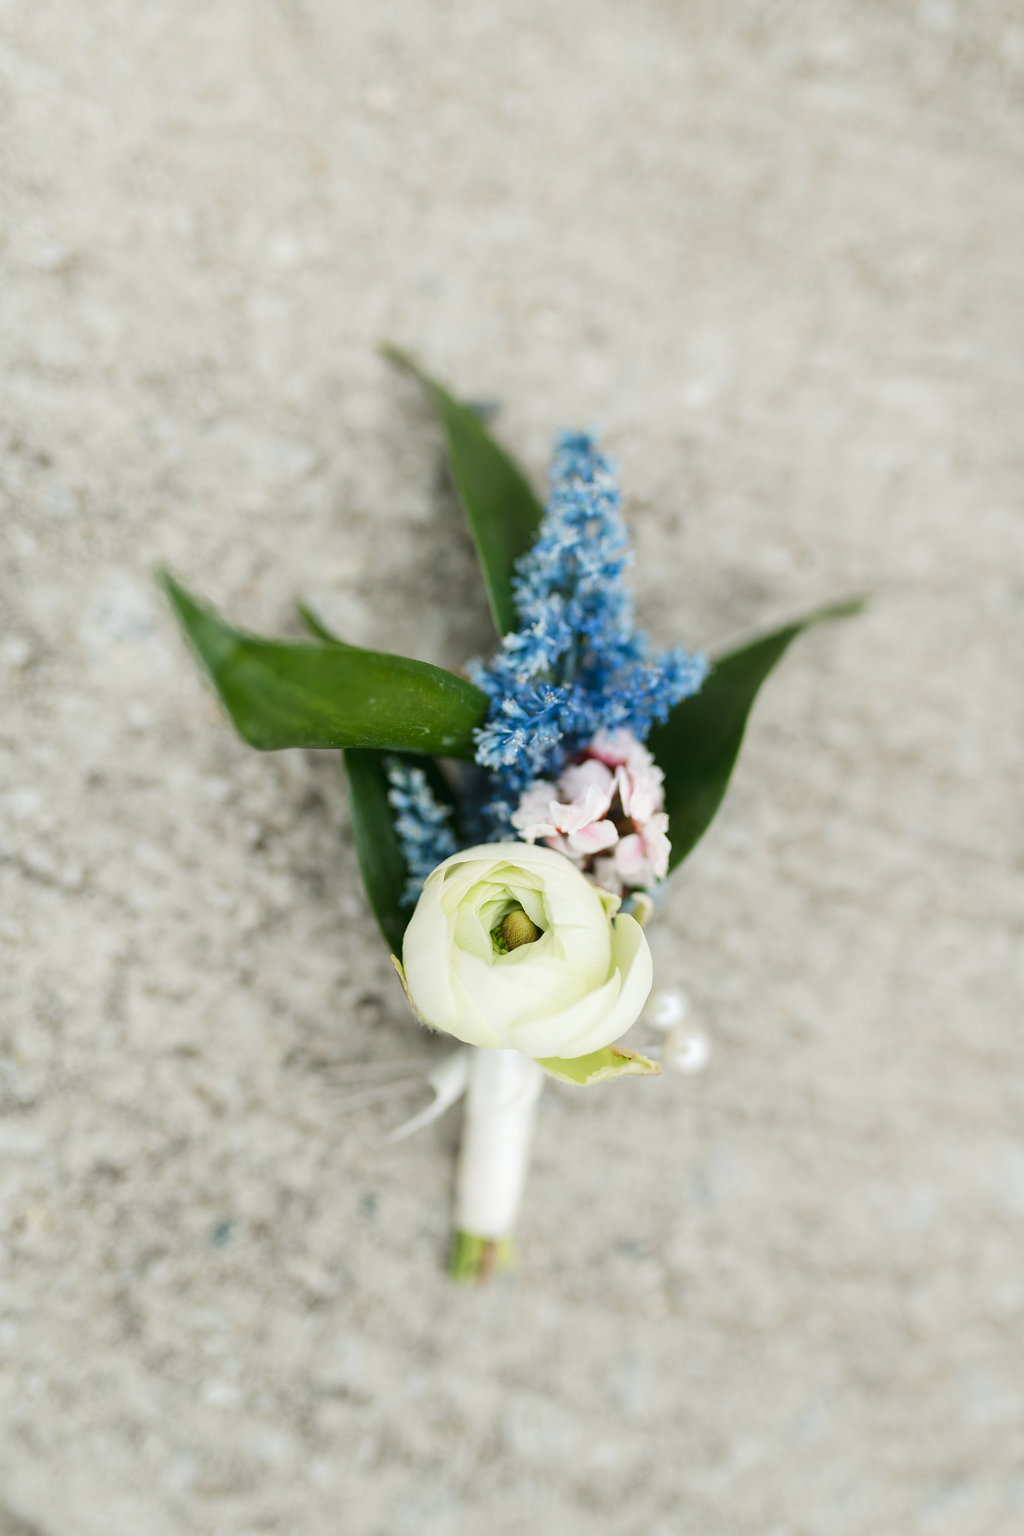 atlanta pop up wedding planners - scarlet plan & design - st. cecilia's buckhead elopement (2).jpg